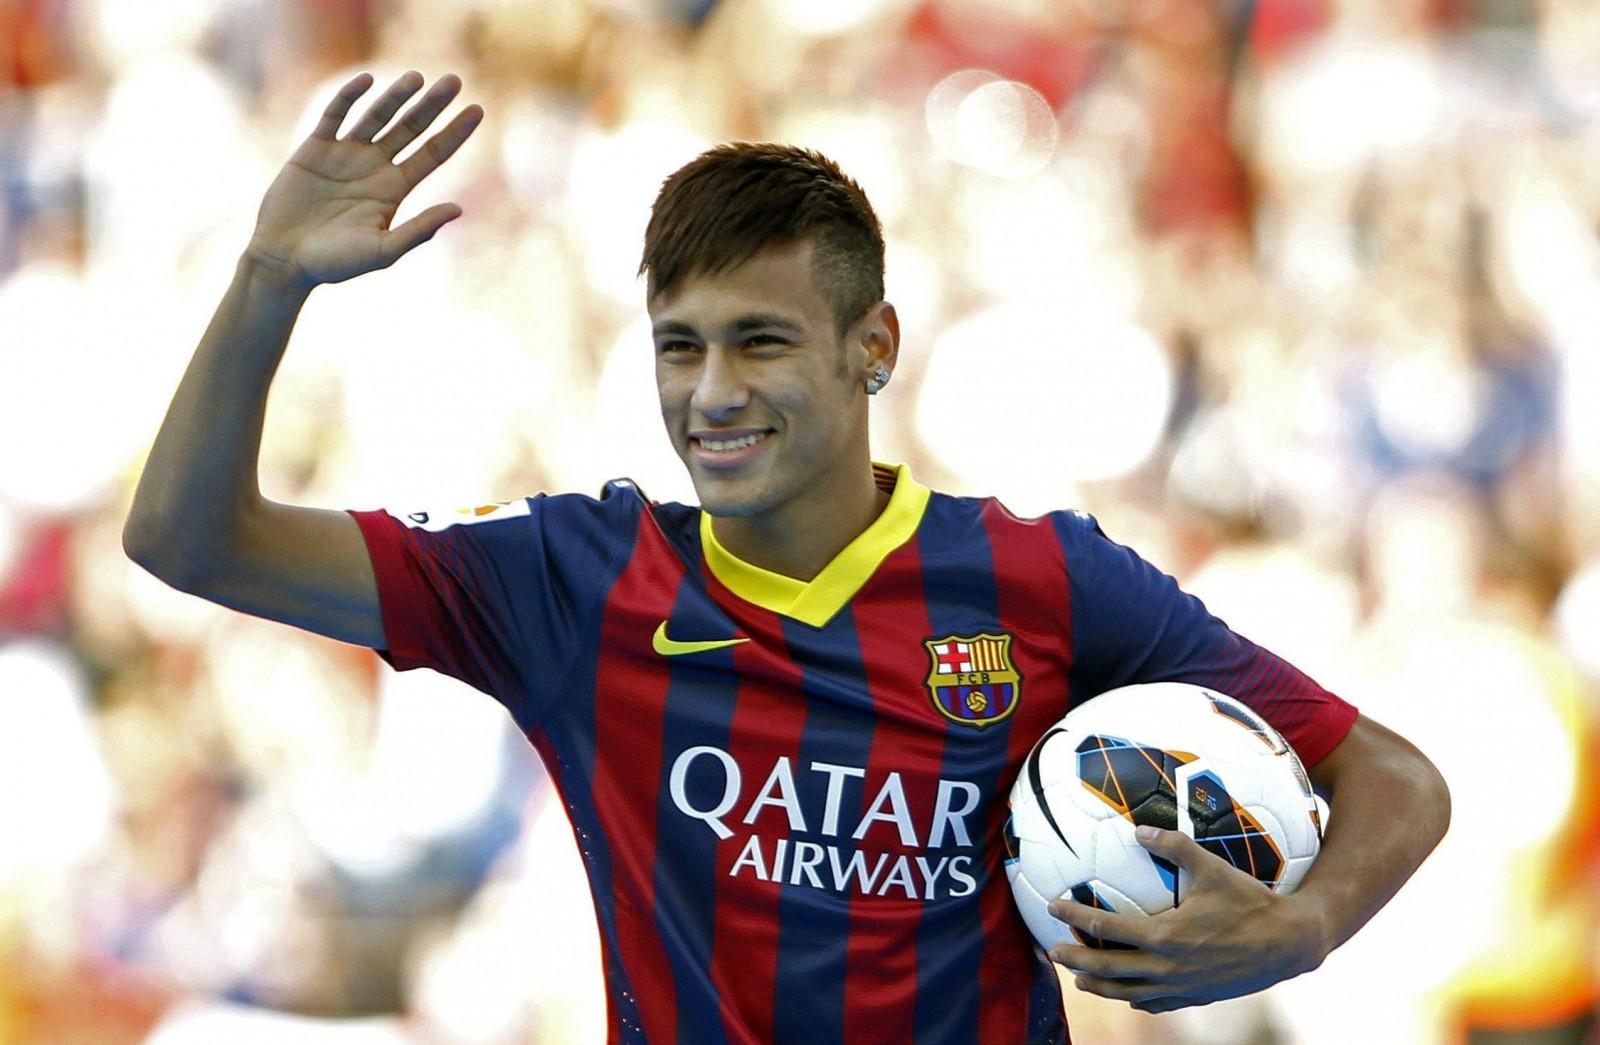 Wallpaper Olahraga Sepak Bola Neymar Kejuaraan Pemain